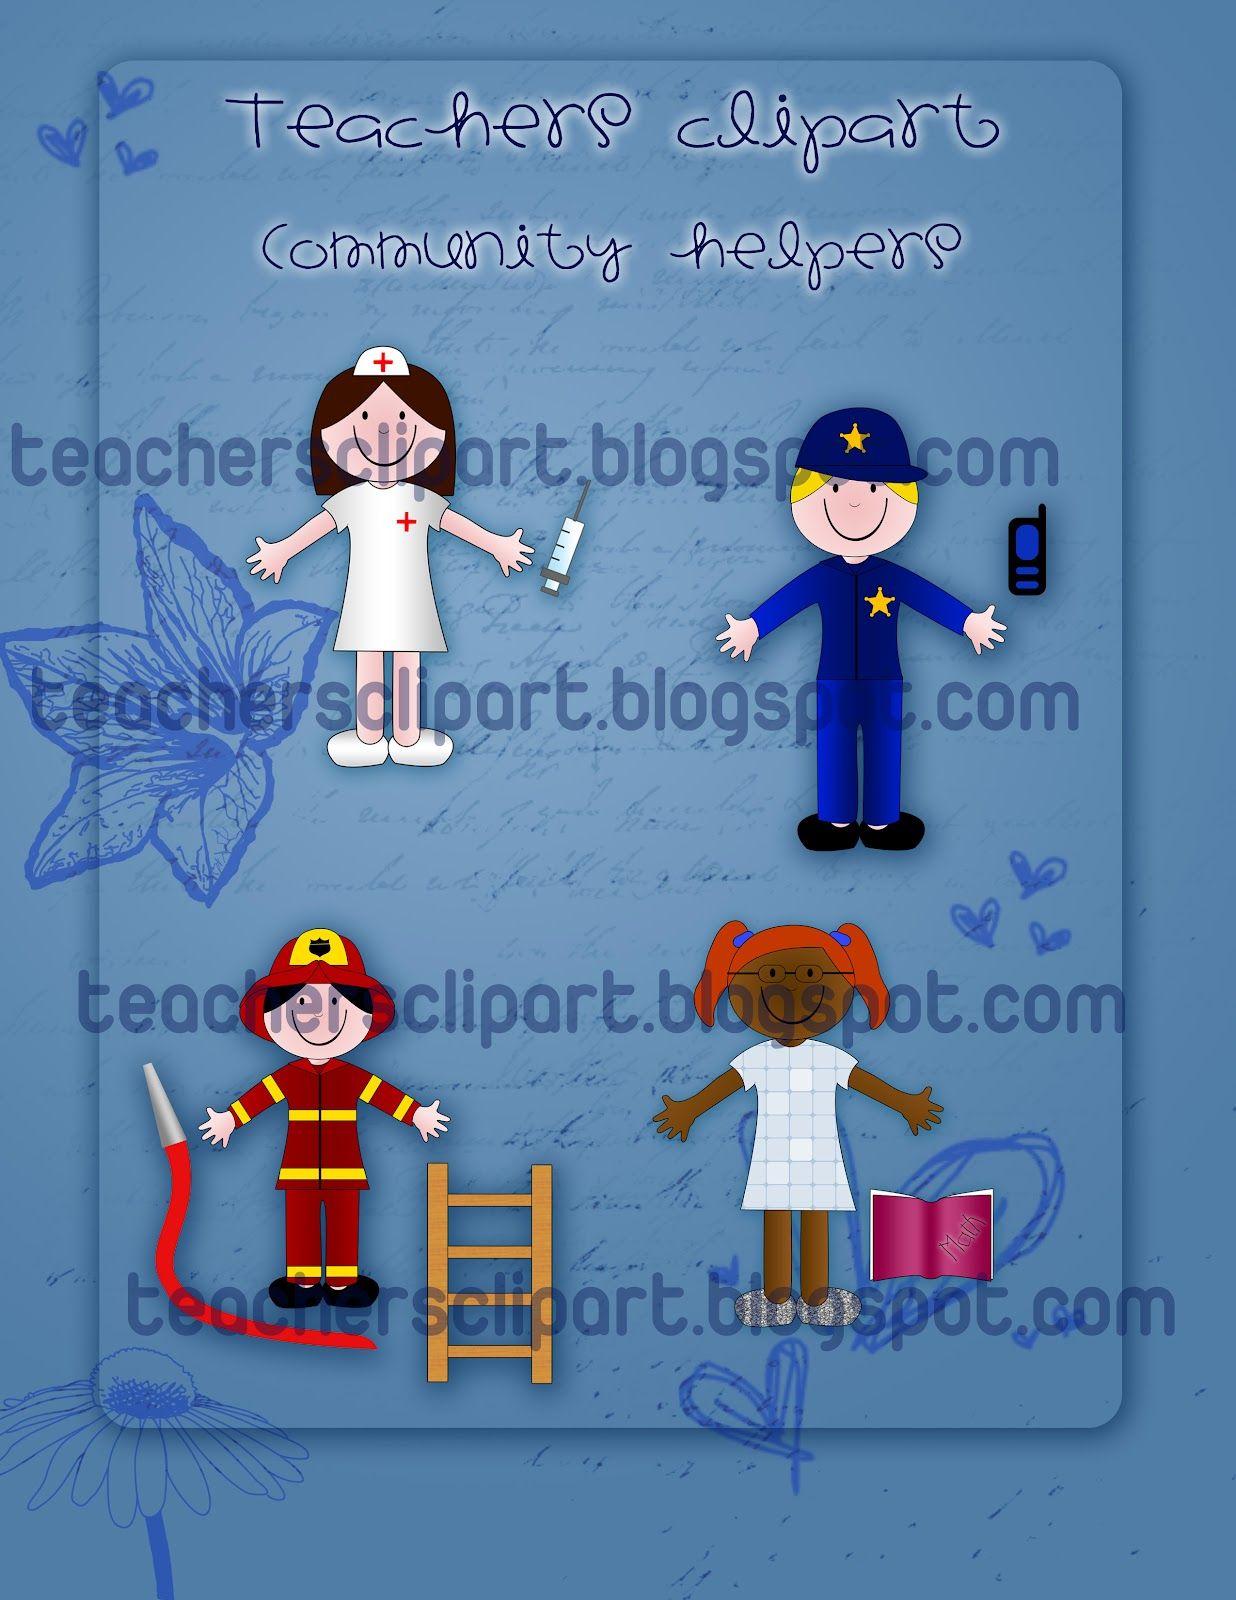 Teacher S Cliparts Community Helpers Clipart